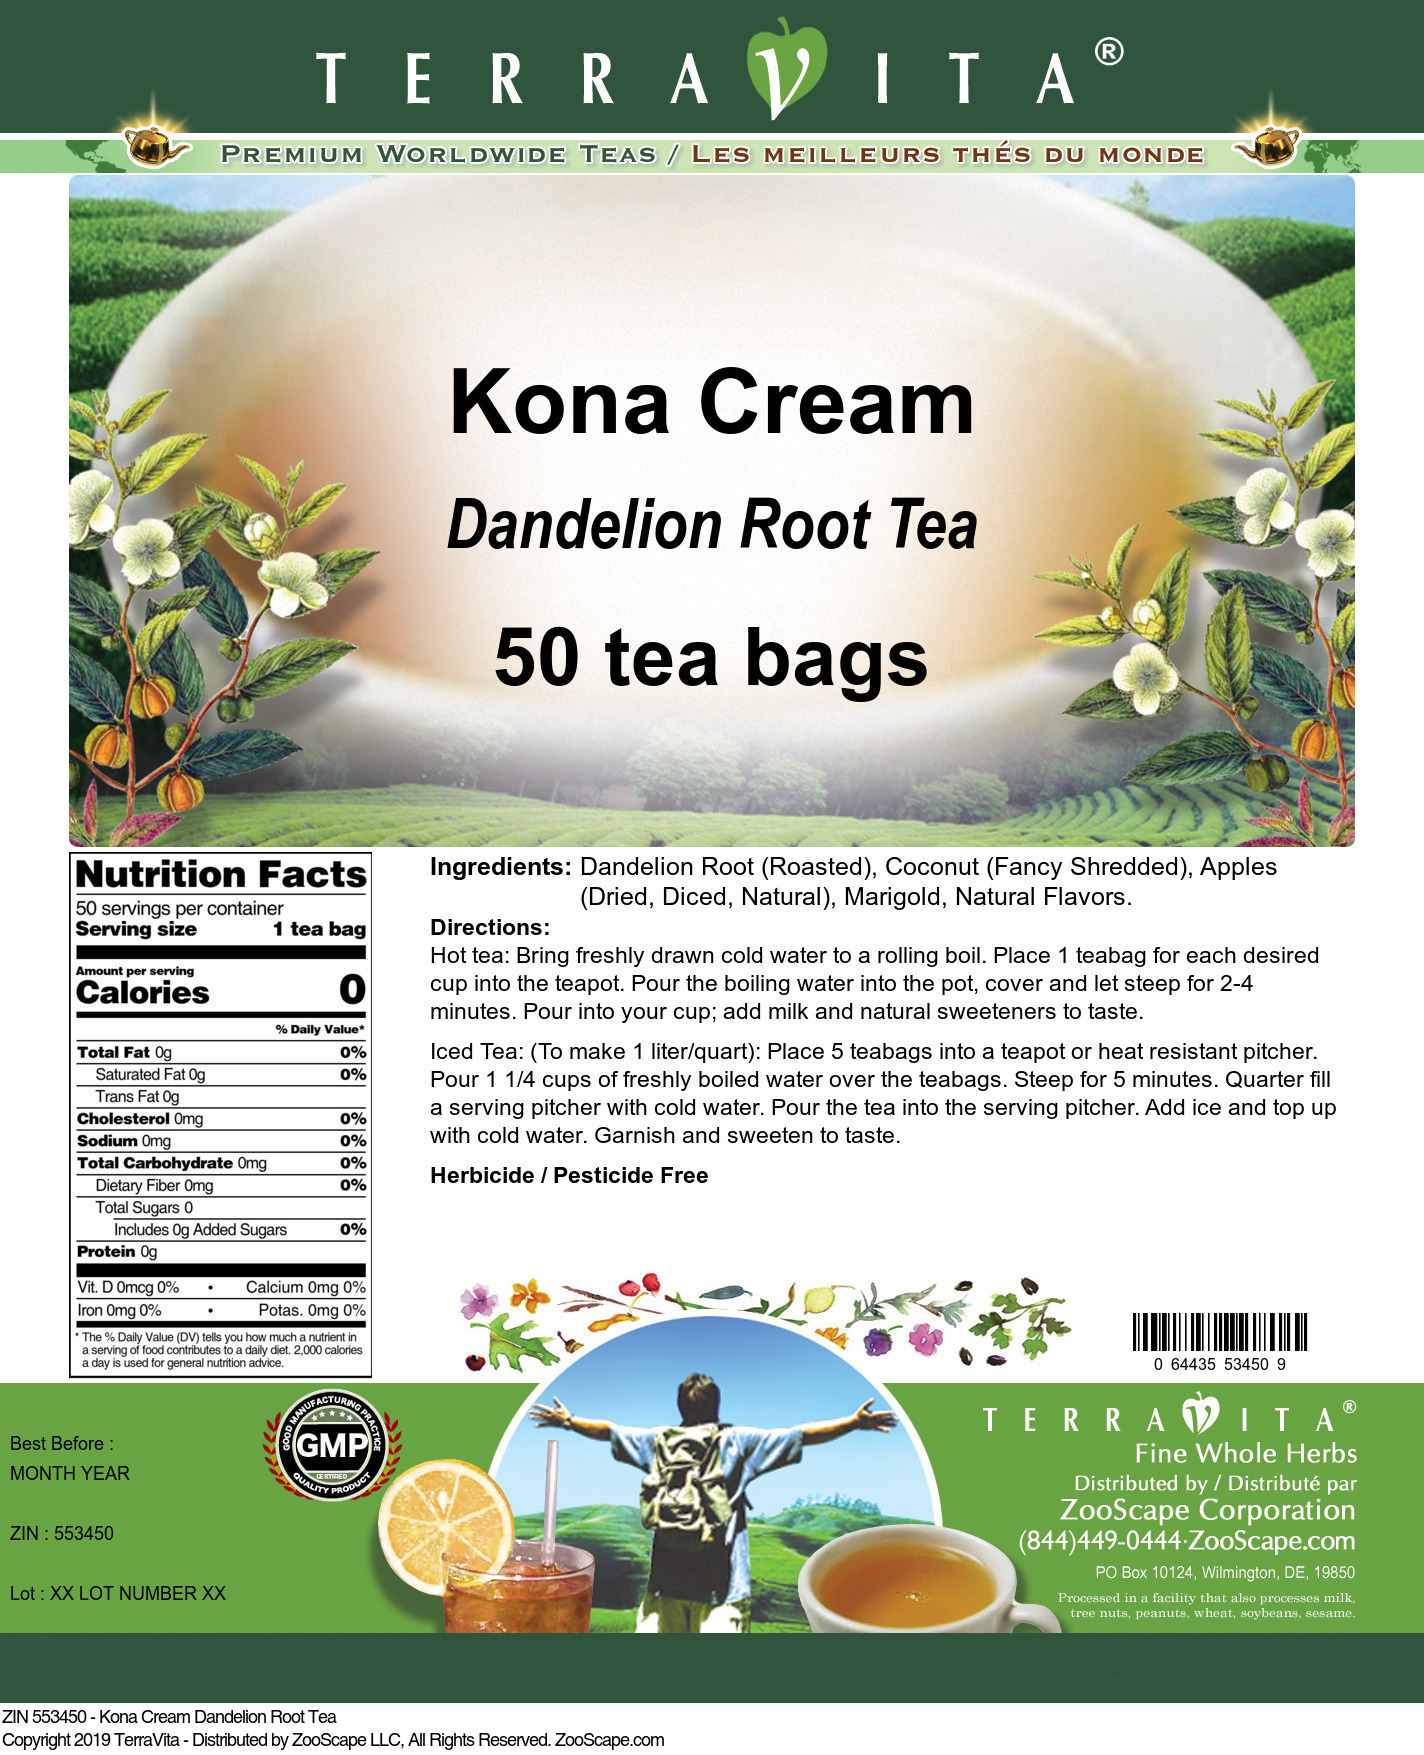 Kona Cream Dandelion Root